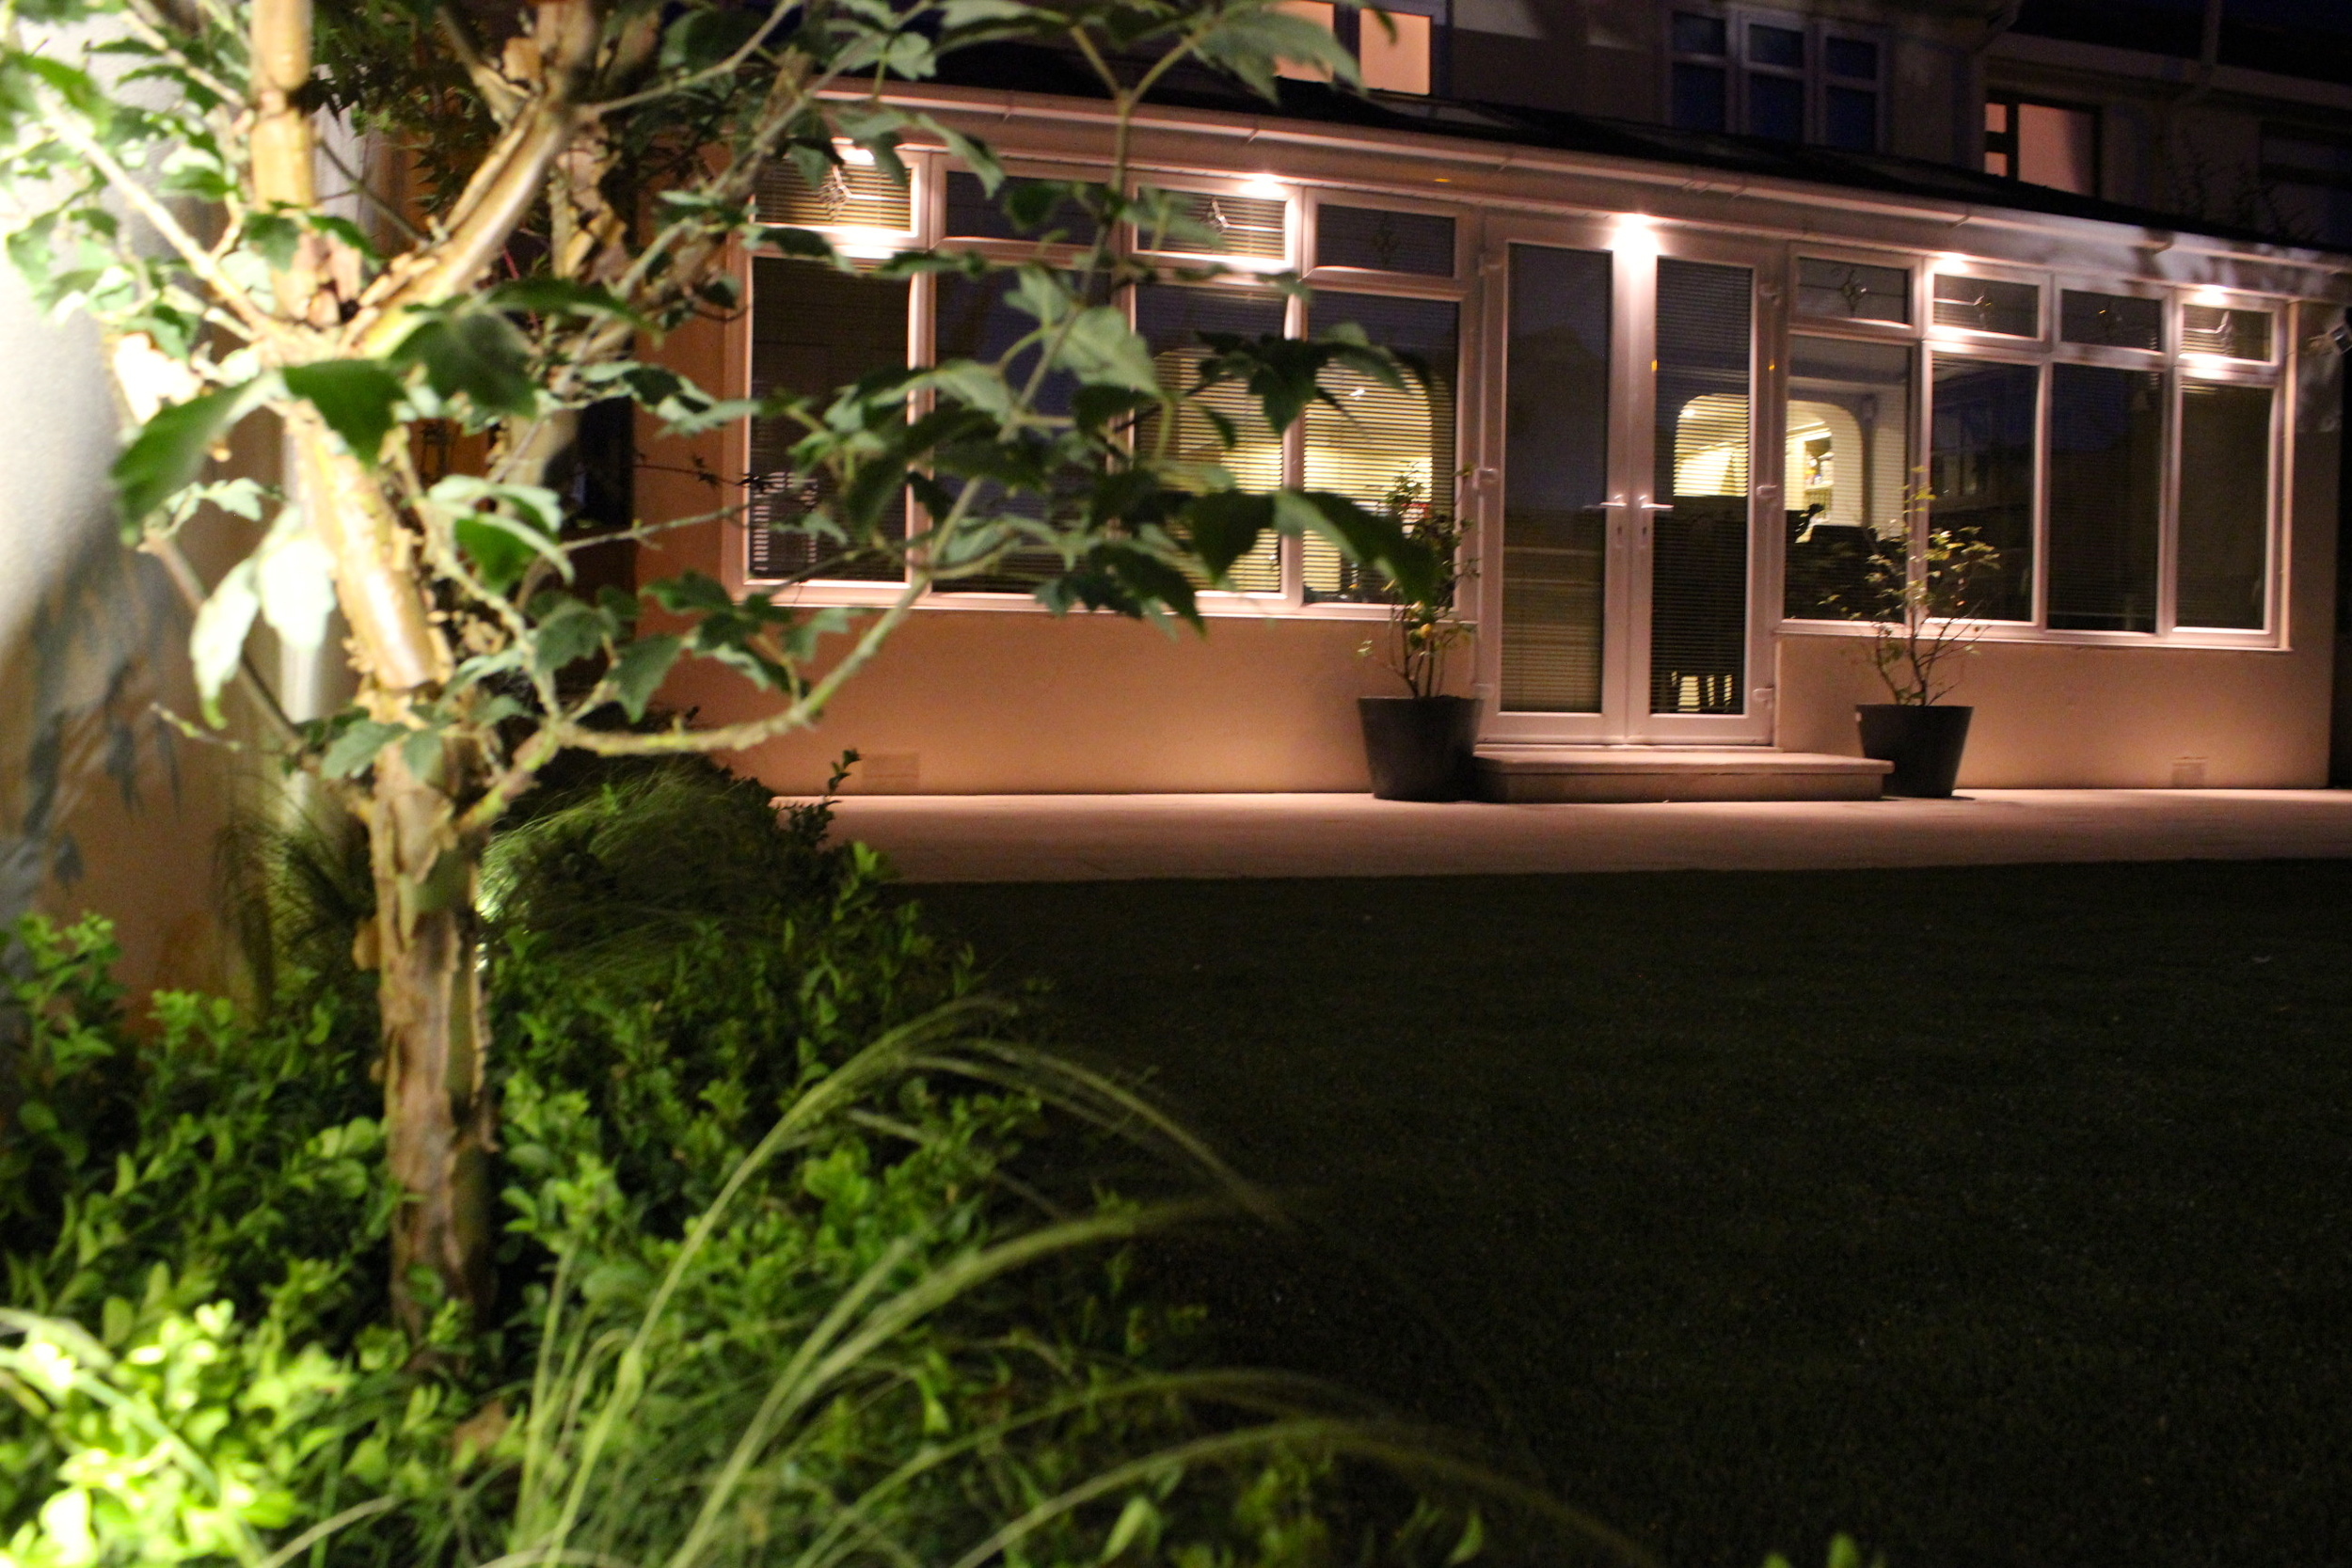 Tree and Patio lighting